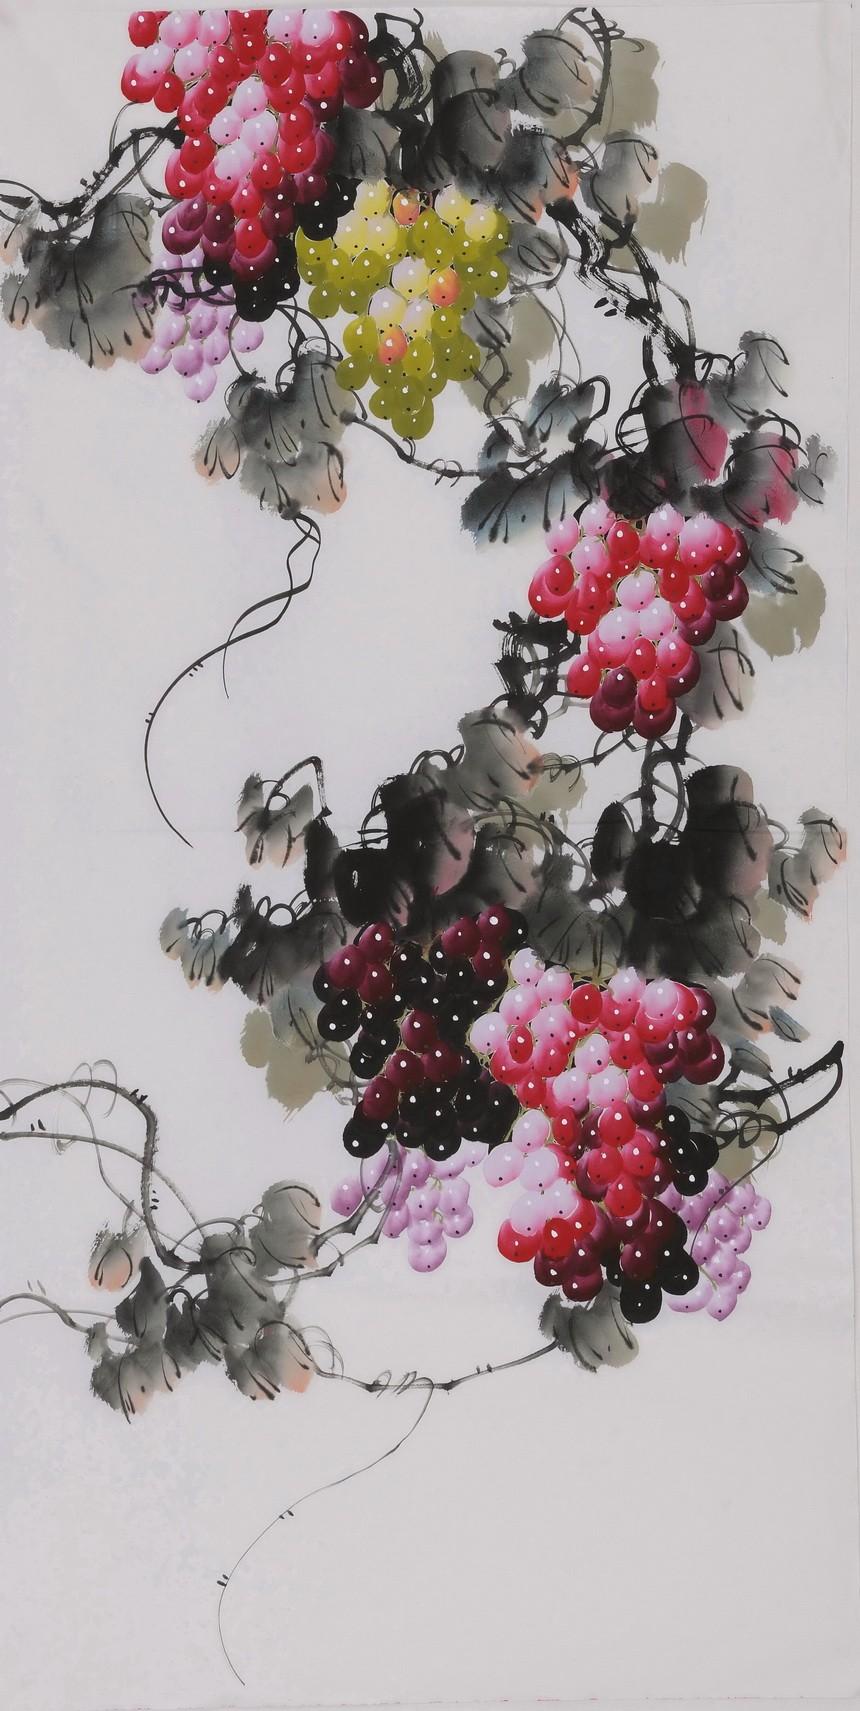 Grapes - CNAG000610